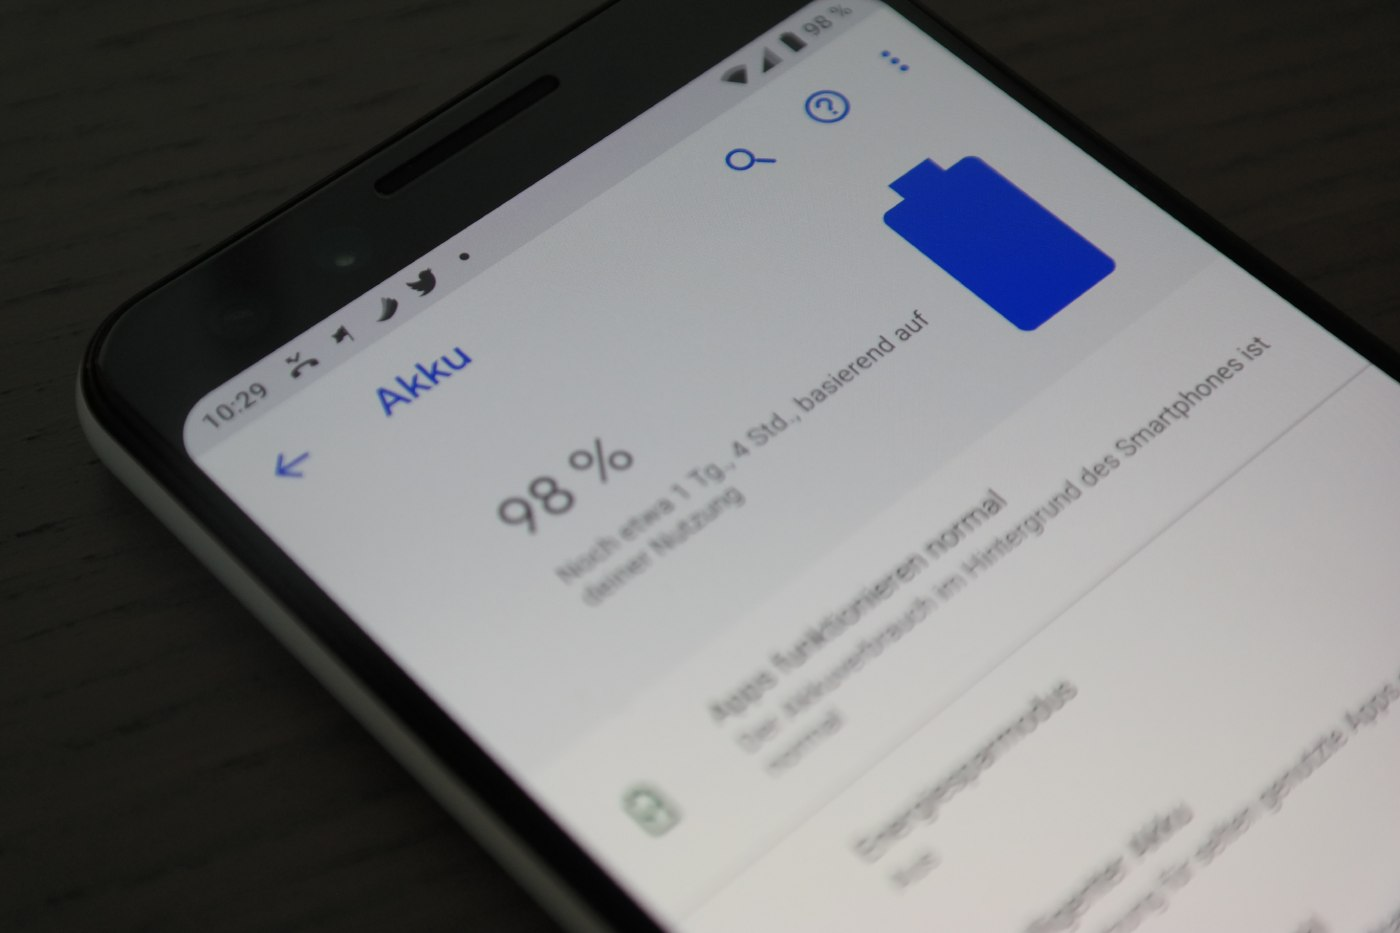 Akku Akkulaufzeit Batterie 1400px Header